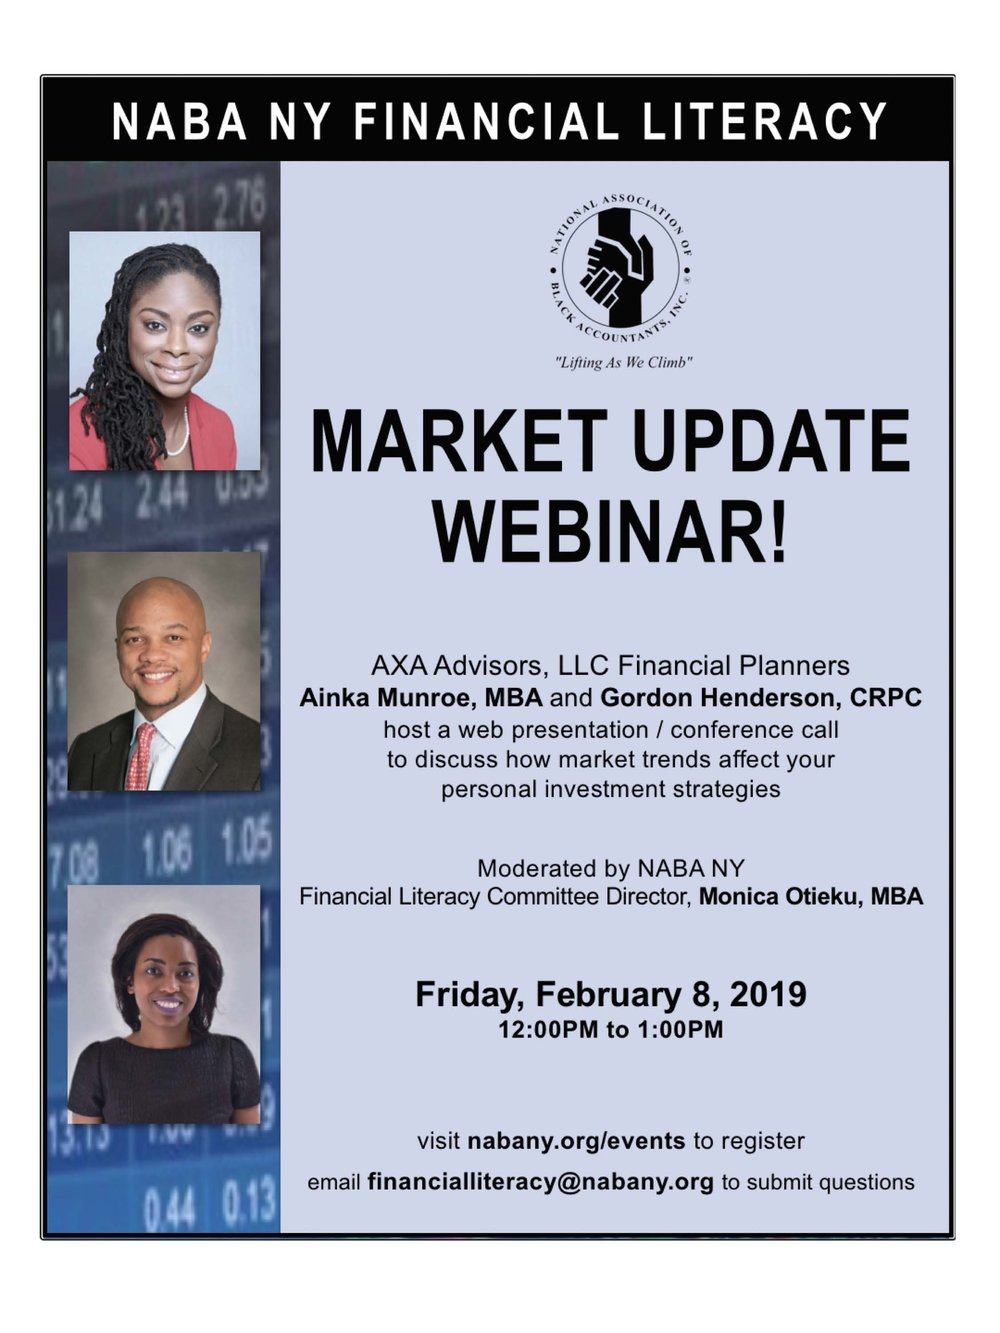 20190208_Market Update_flier1.jpg